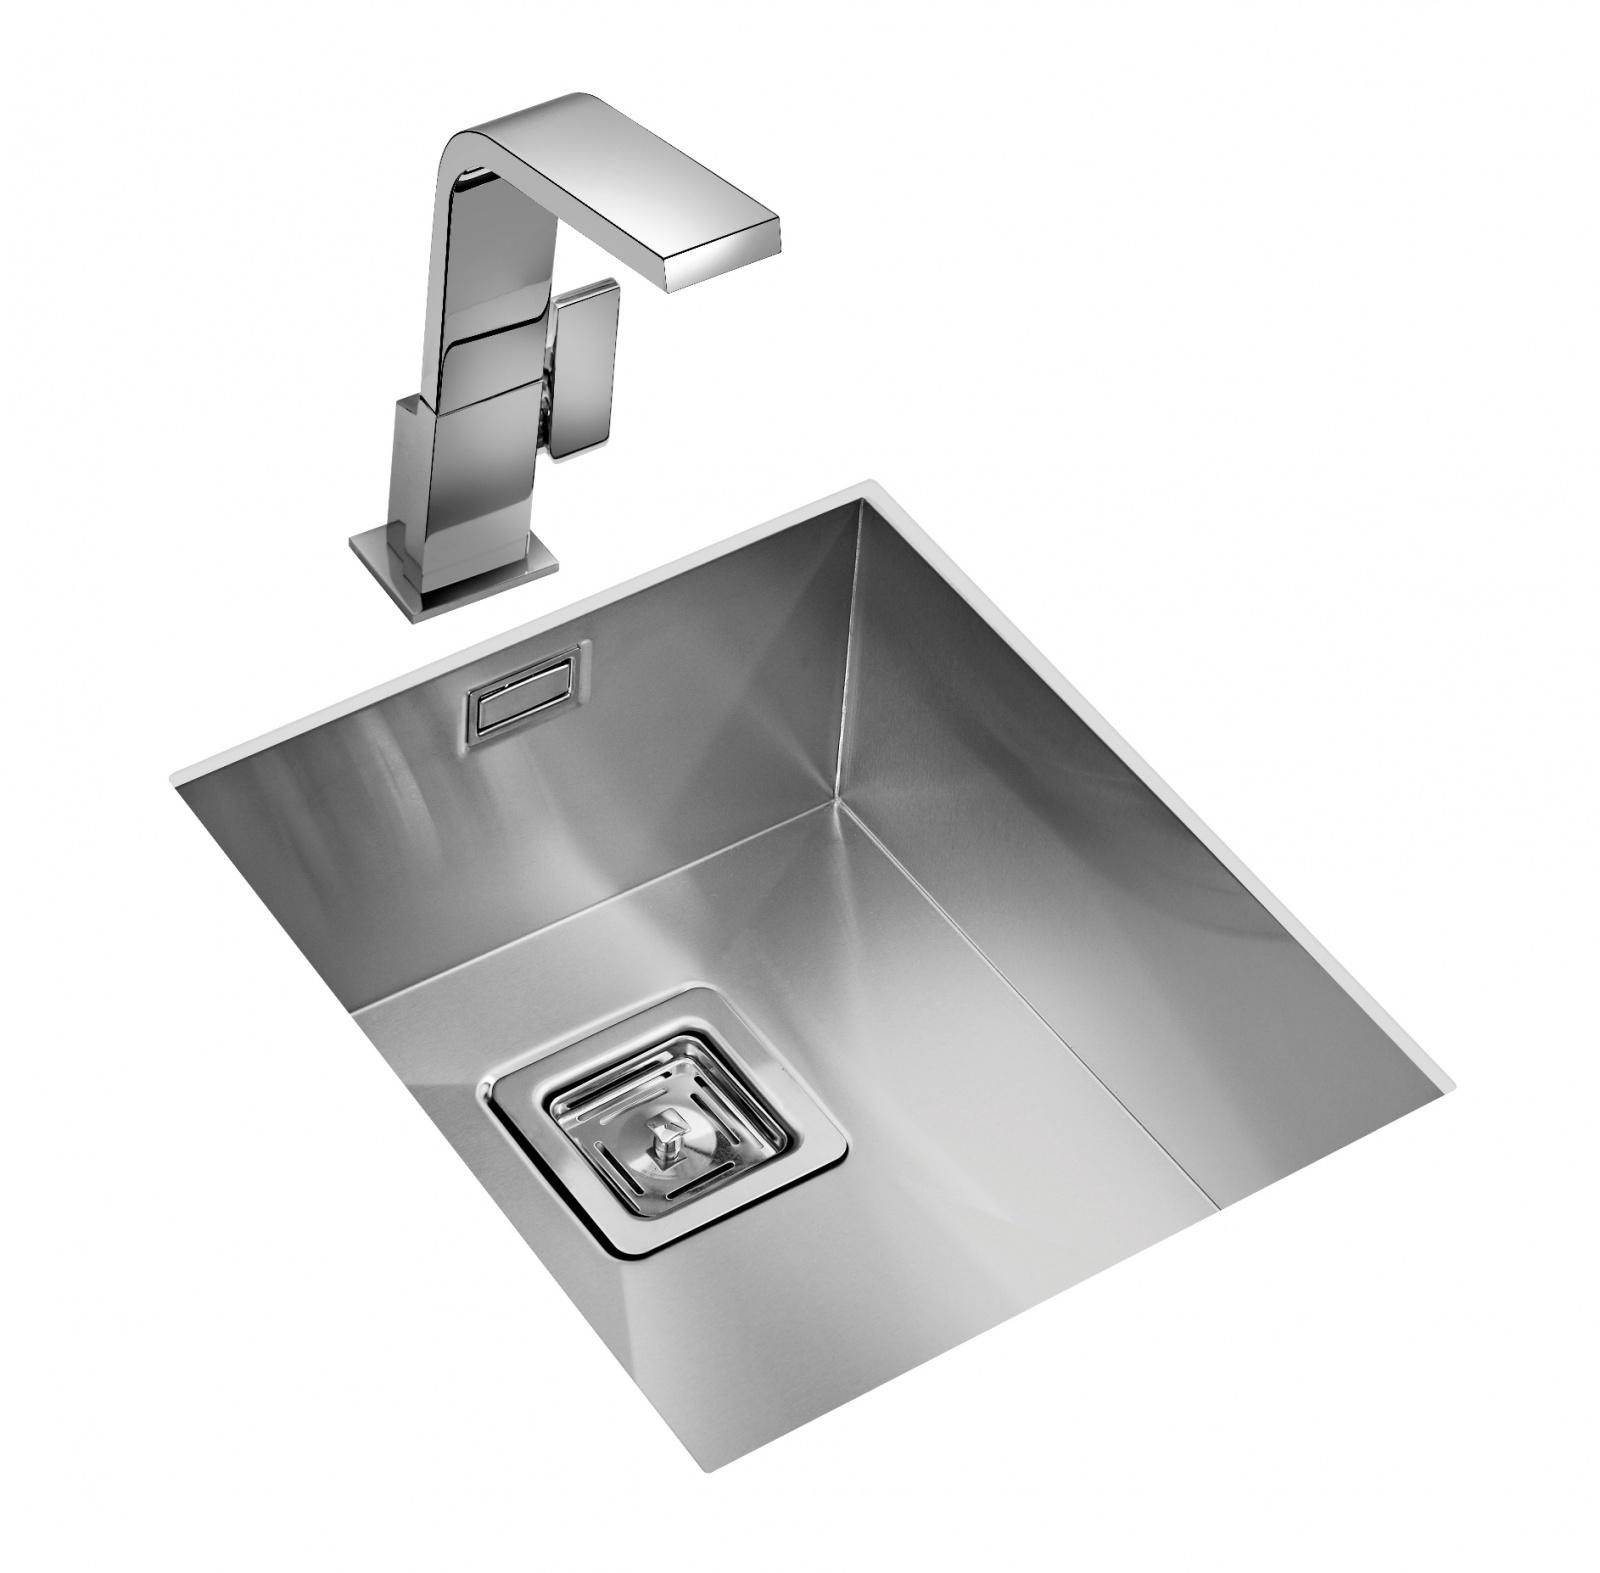 Teka Edelstahl Unterbau Einbauspüle Spüle Küchenspüle Küchen ...